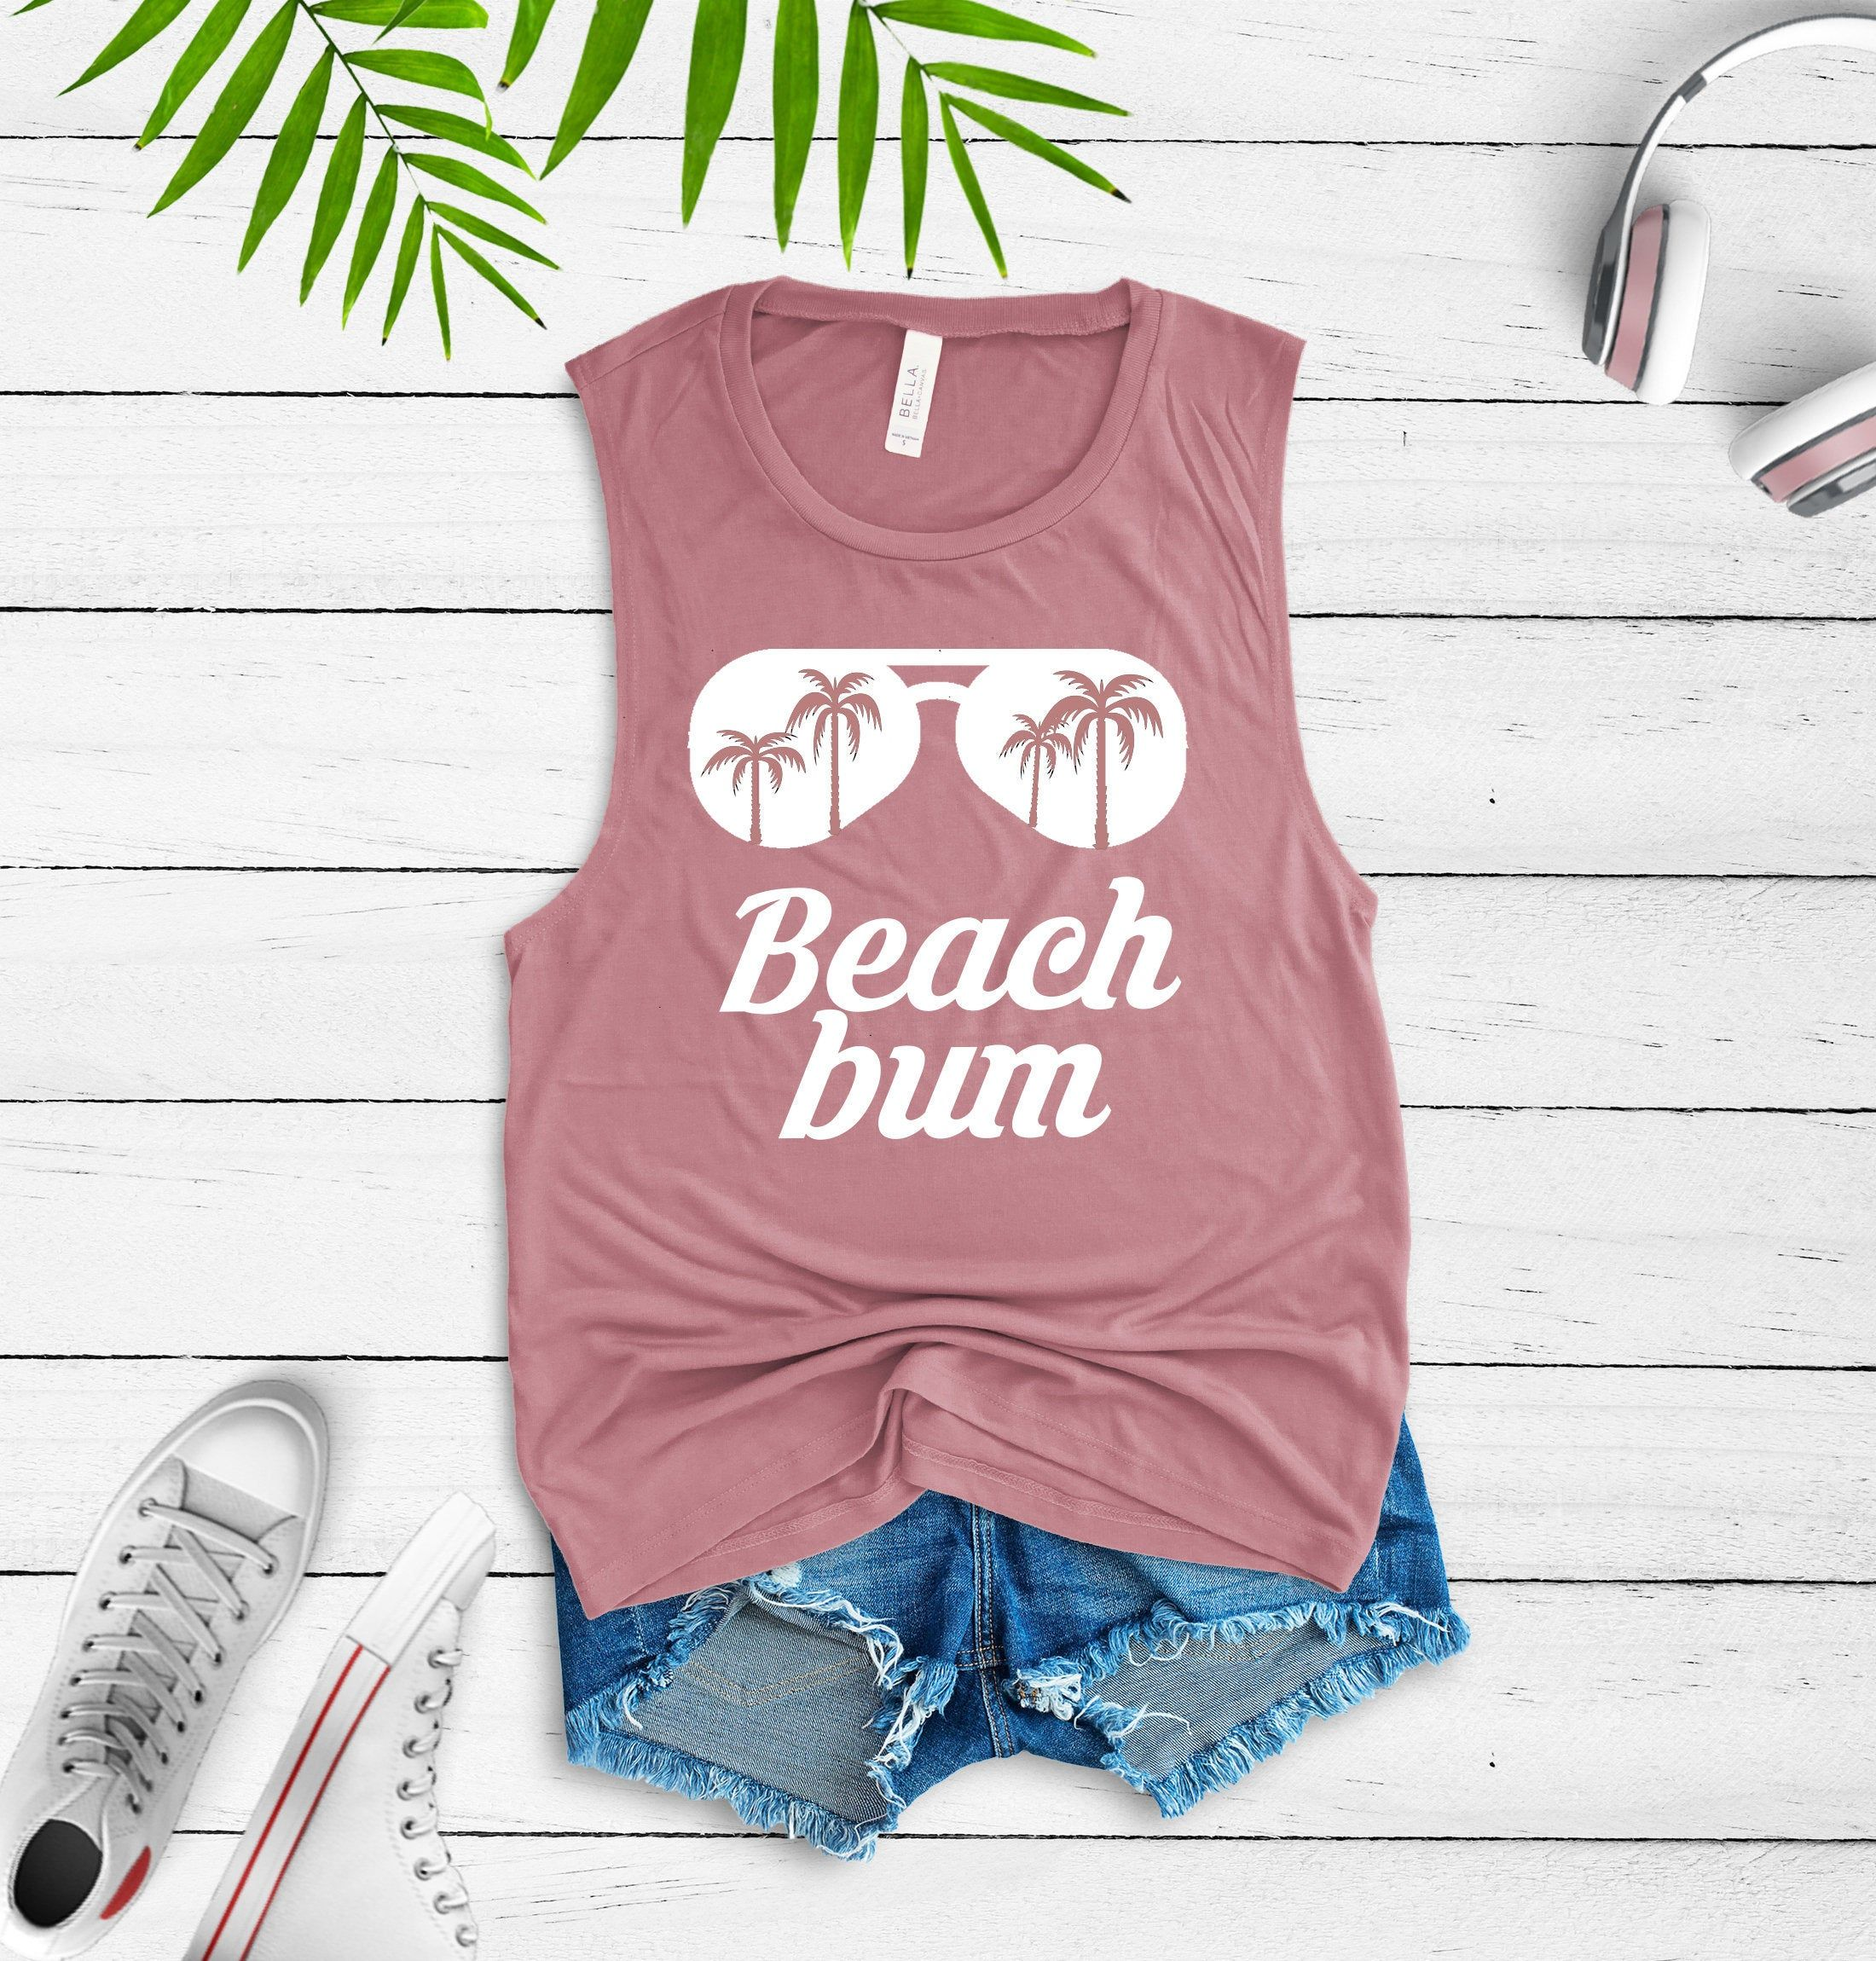 beach tank, sunglasses tank, vacation tank, beach bum tank, beach vacation tank, tropical vacation tank top, gift for beach lover